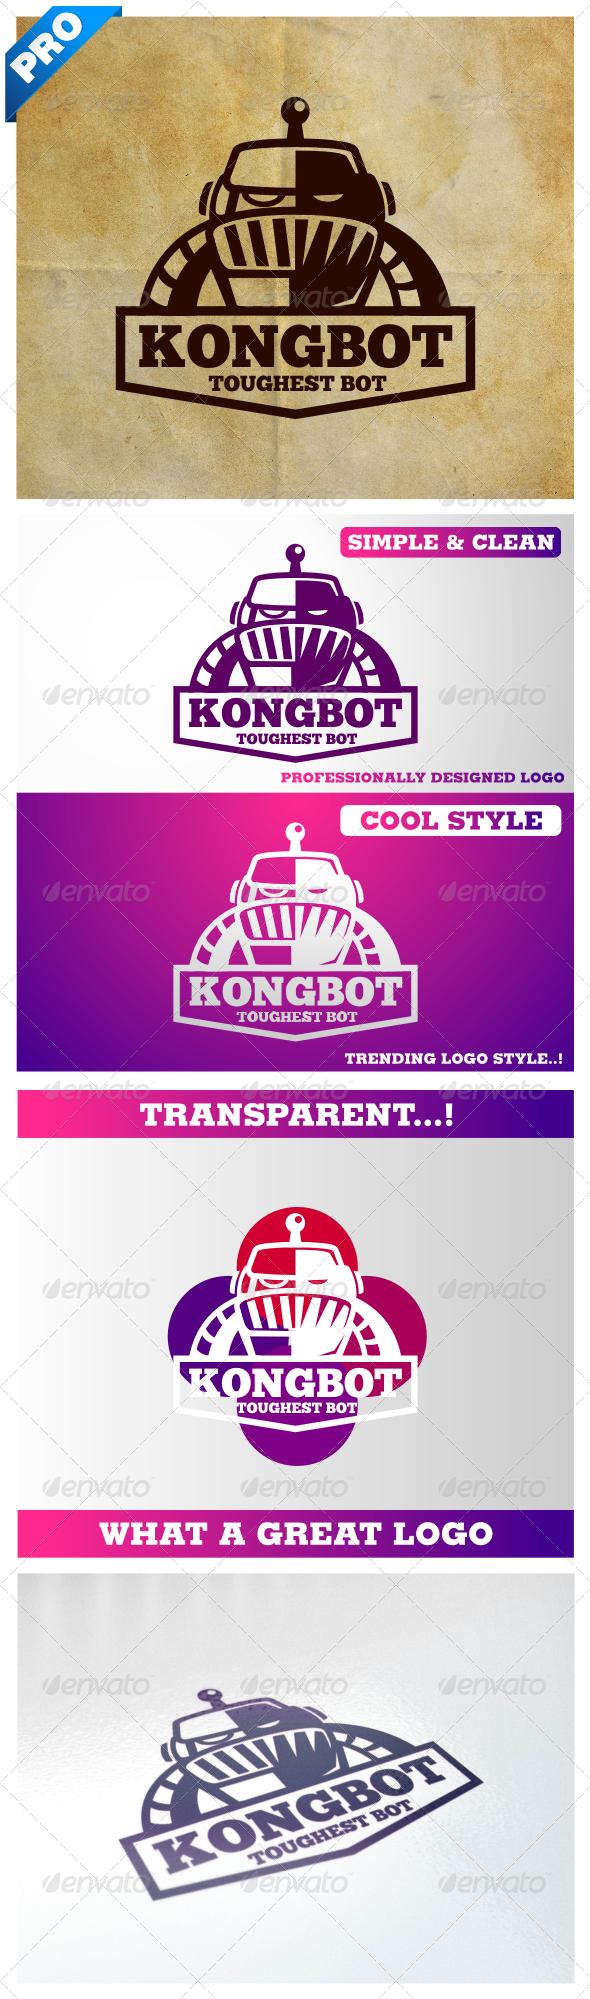 GraphicRiver Vintage Retro Robot V.2 Kongbot 4499961